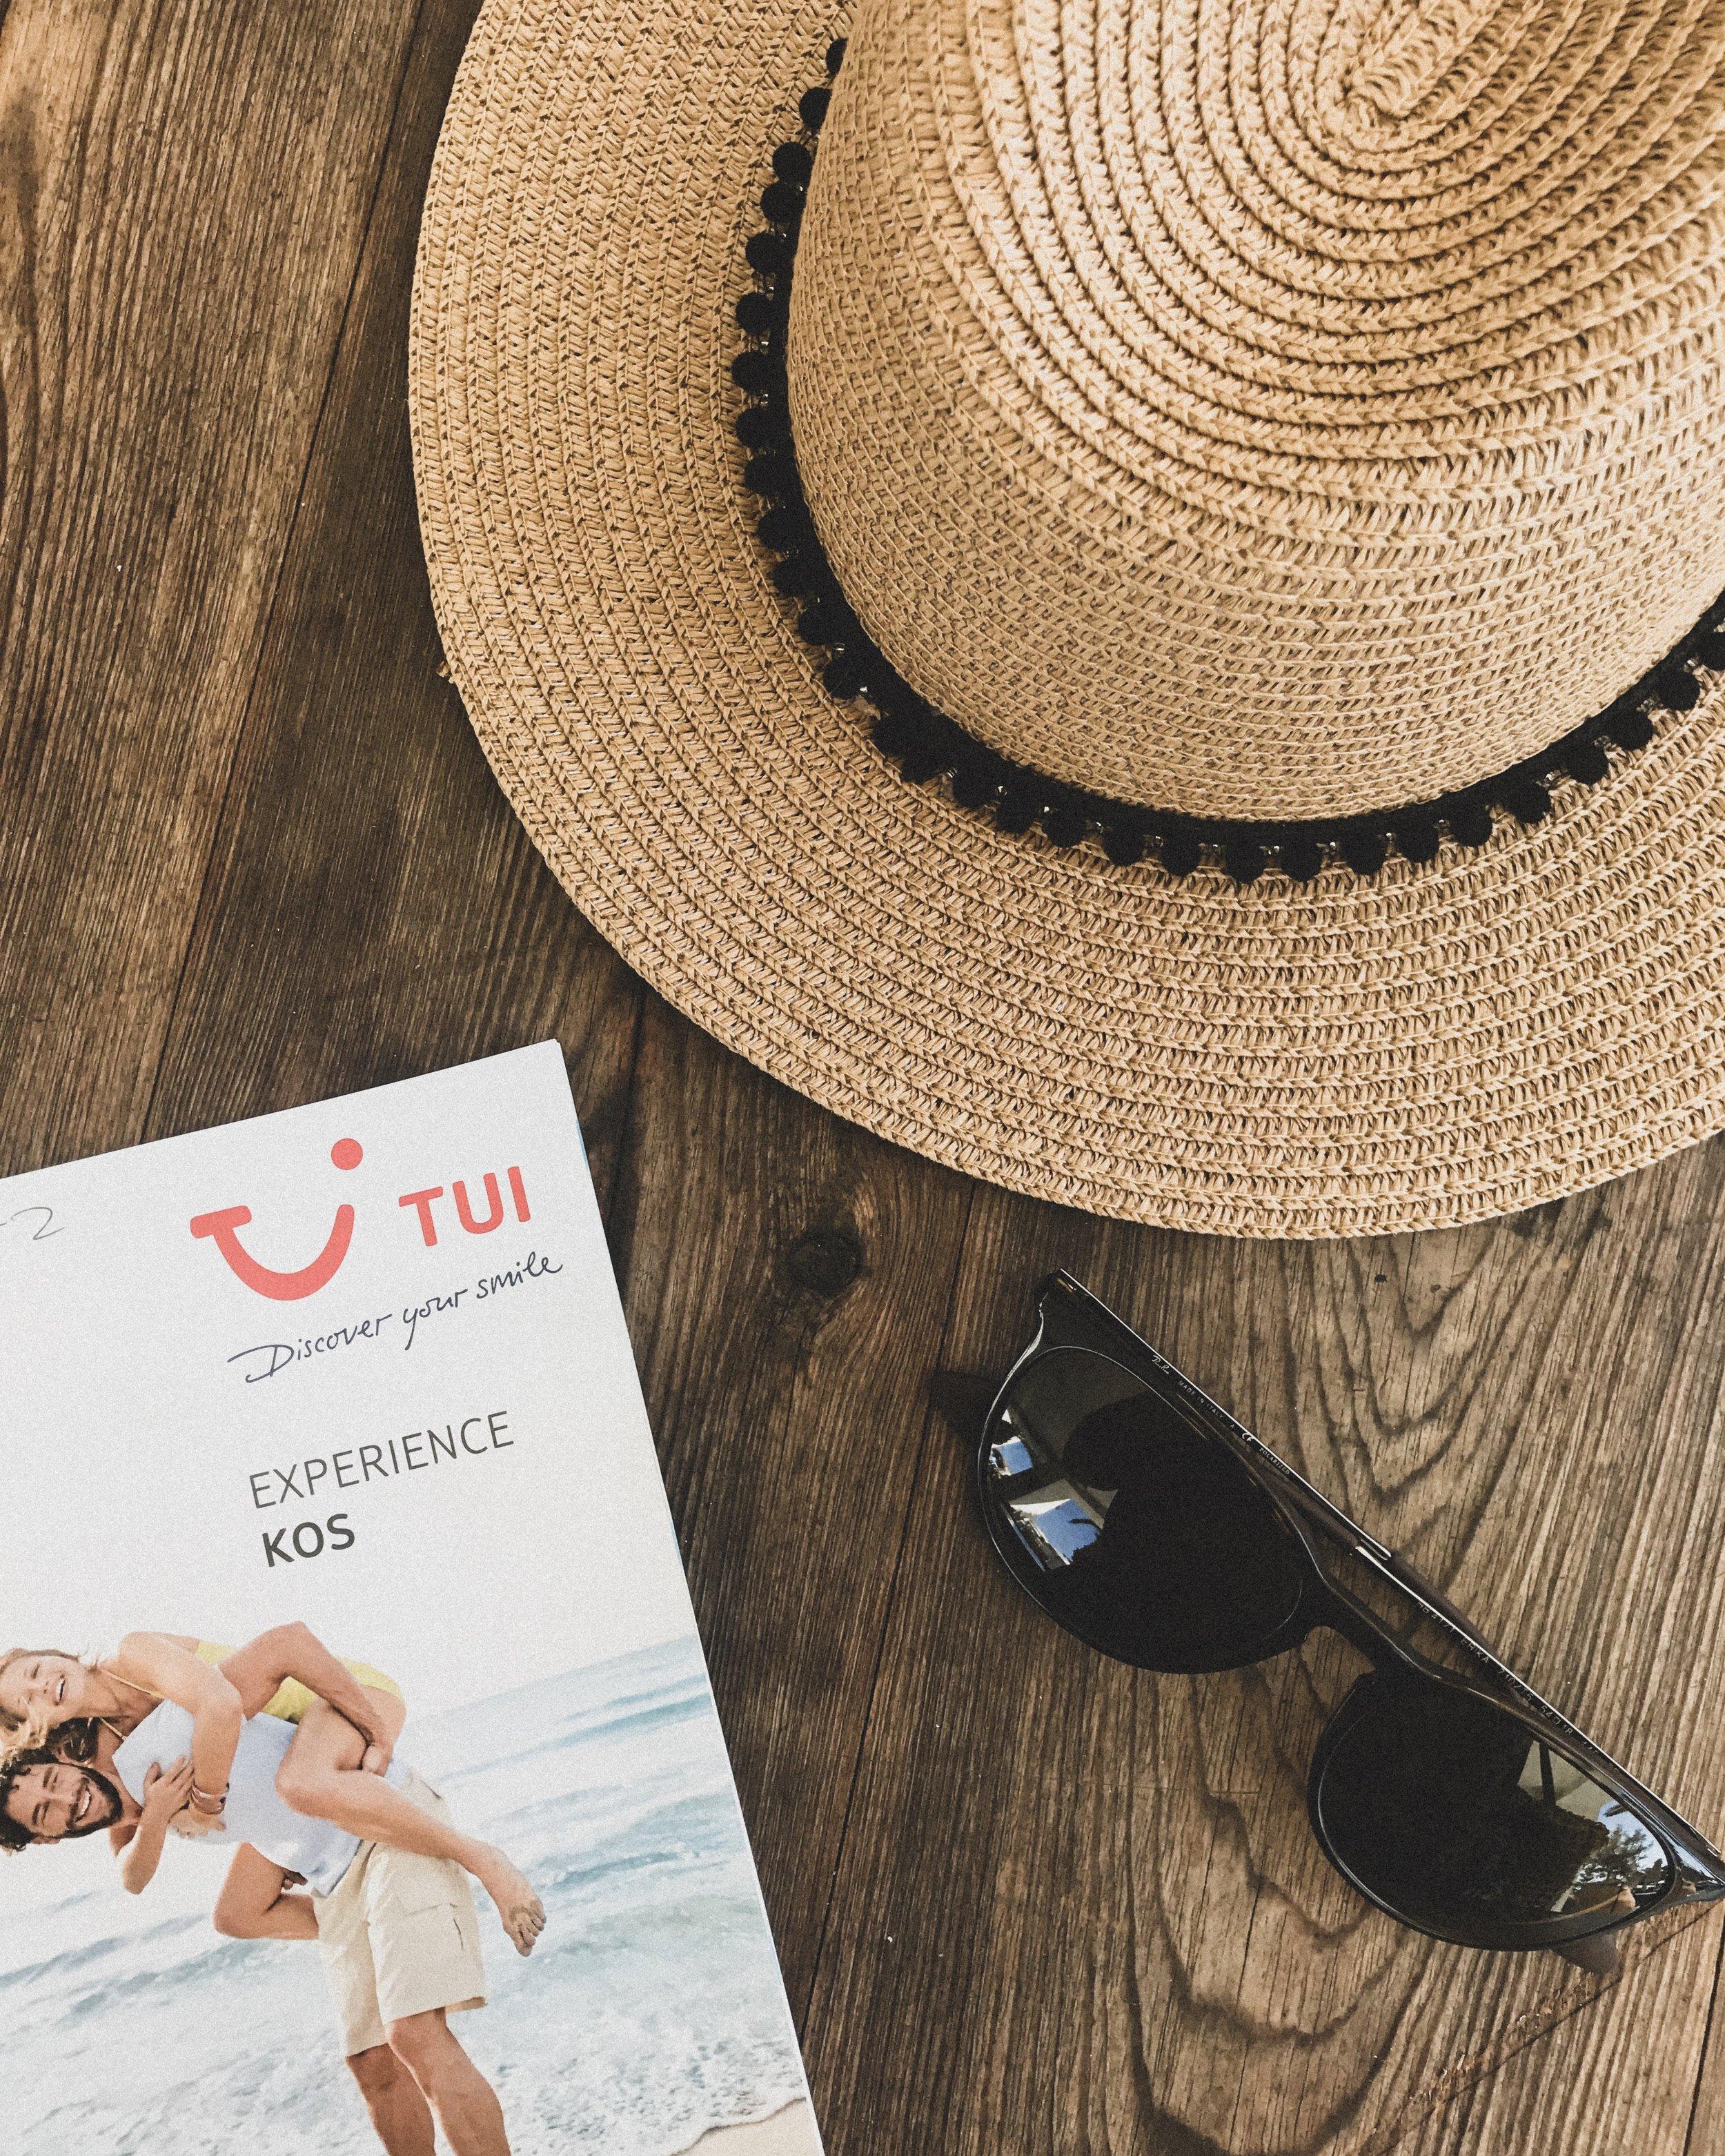 TUI Welcome Pack Holiday, Kos Greece